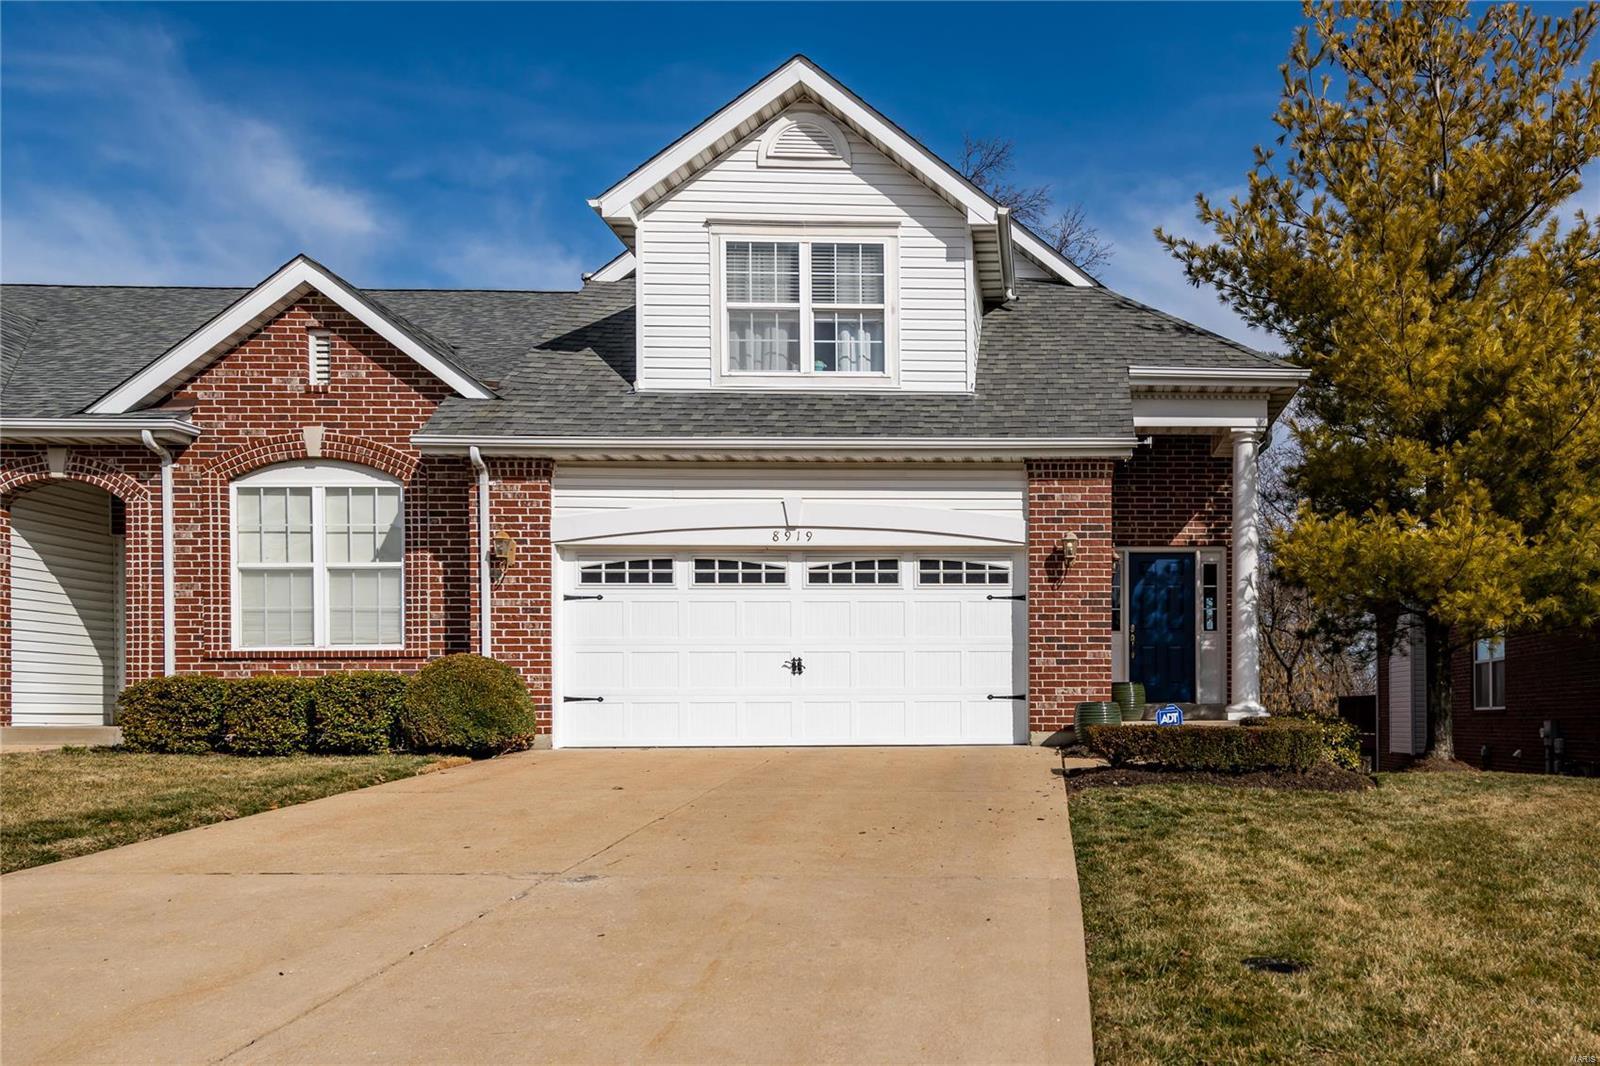 8919 Hilltop Manor Drive Property Photo - Olivette, MO real estate listing